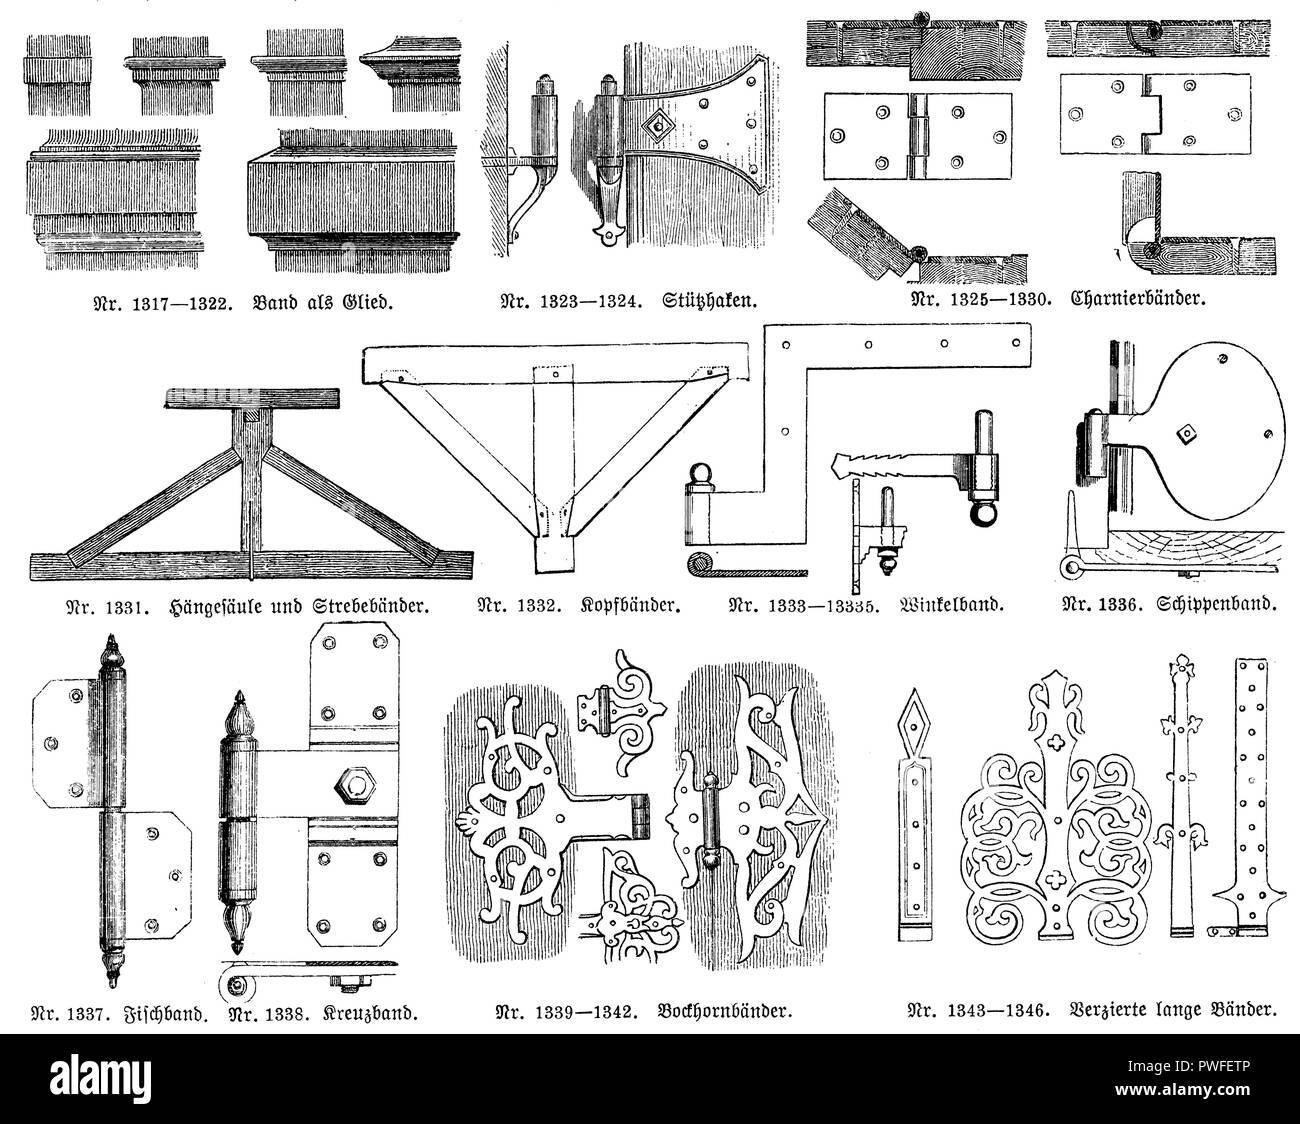 No. 1317-1322. Volume as member, No. 1323-1324. Piece hook, No. 1325-1330. Hinged hinges, No. 1331. Hanging column and braces, 1332. Headbands, No. 1333-1335. Angled band, No. 1336. Schippenband, No. 1337. Fish band, 1338. Kreuzband, 1339-1342. Bockhornbands, 1343-1346. Decorated long ribbons, - Stock Image